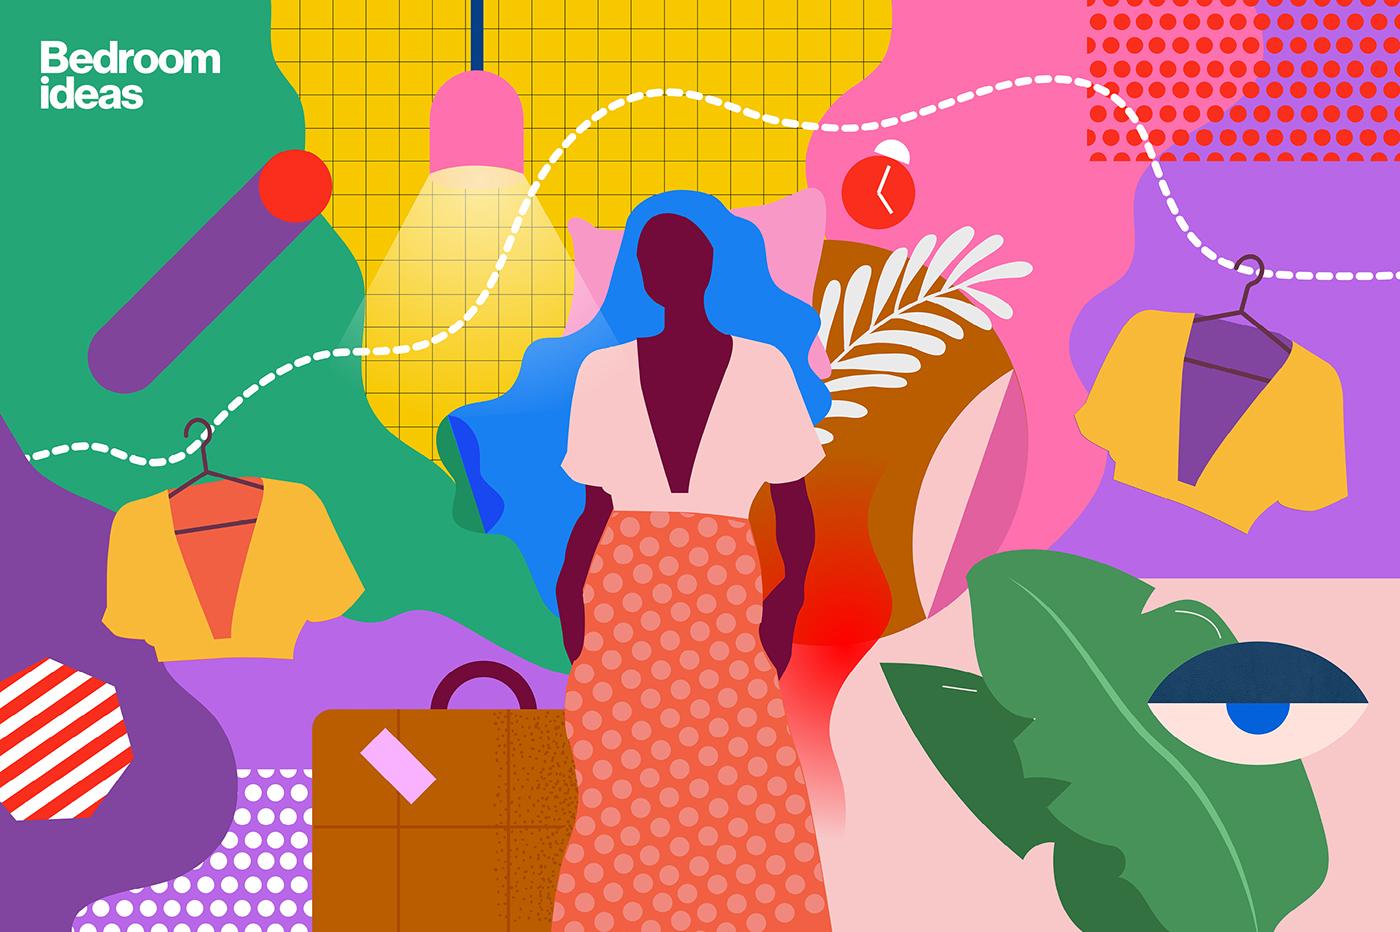 Pinterest ILLUSTRATION  home decor Interior colours shapes branding  bedroom accessories plants